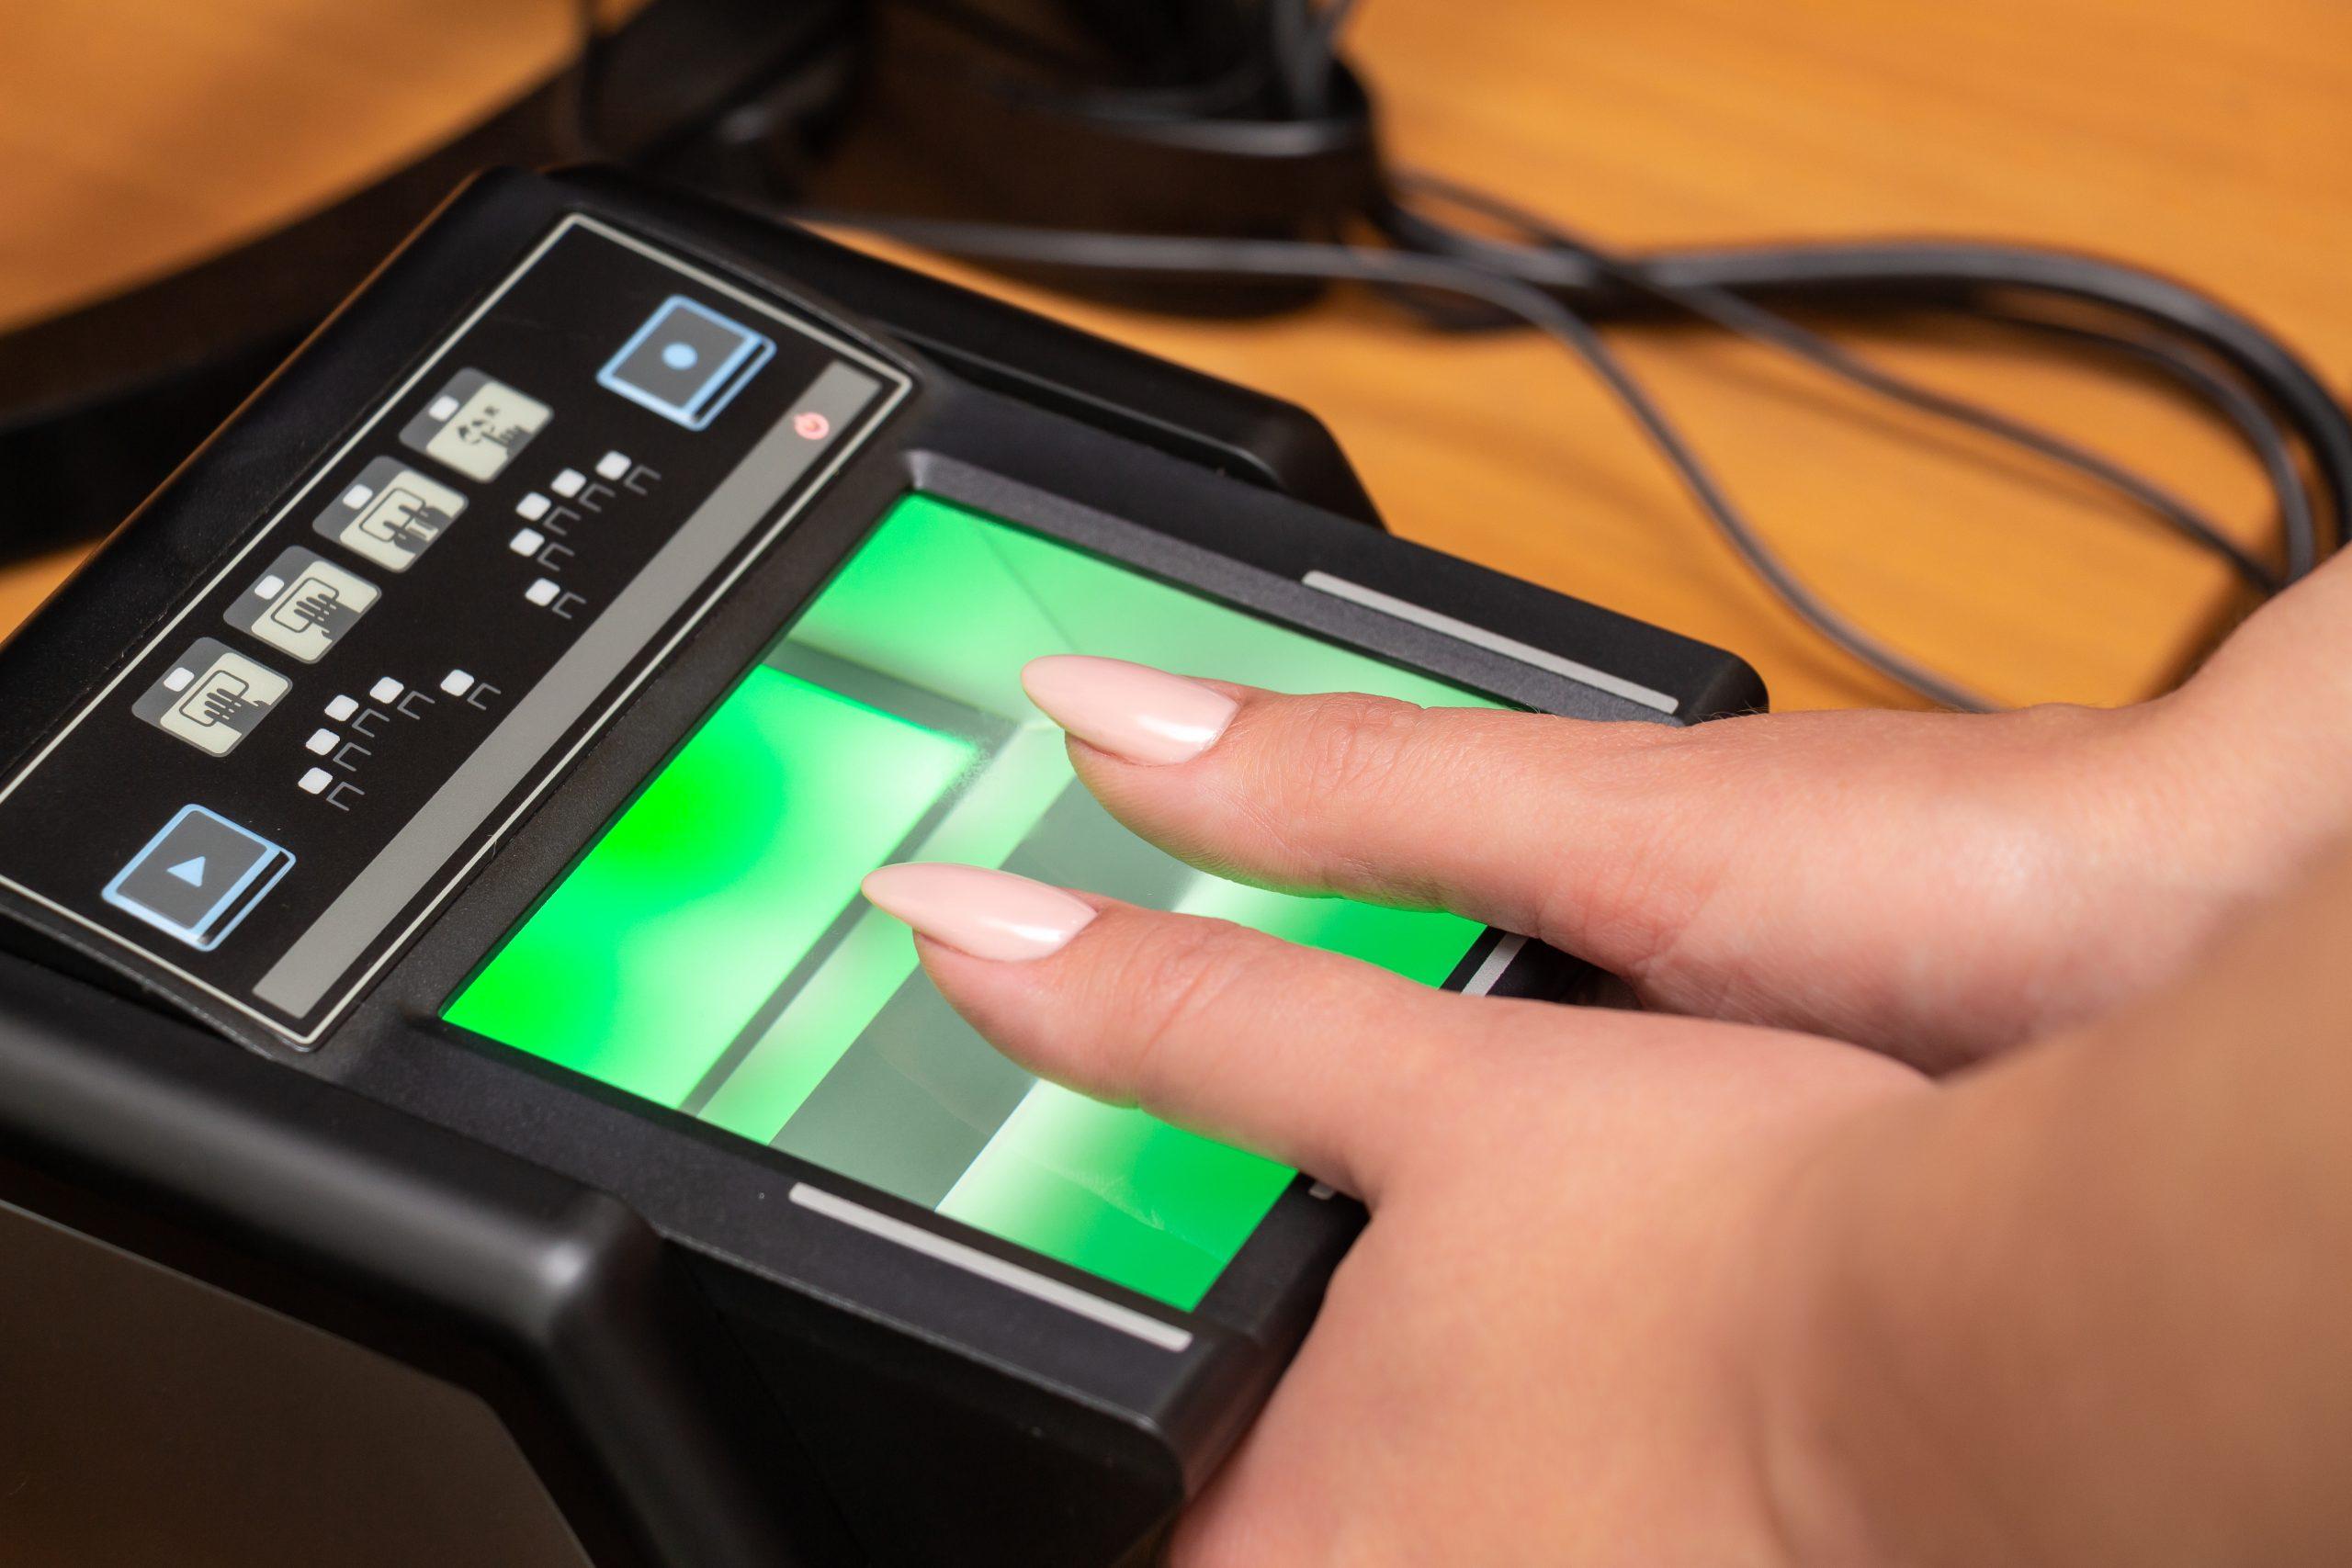 Biometric enrolment for Schengen visas